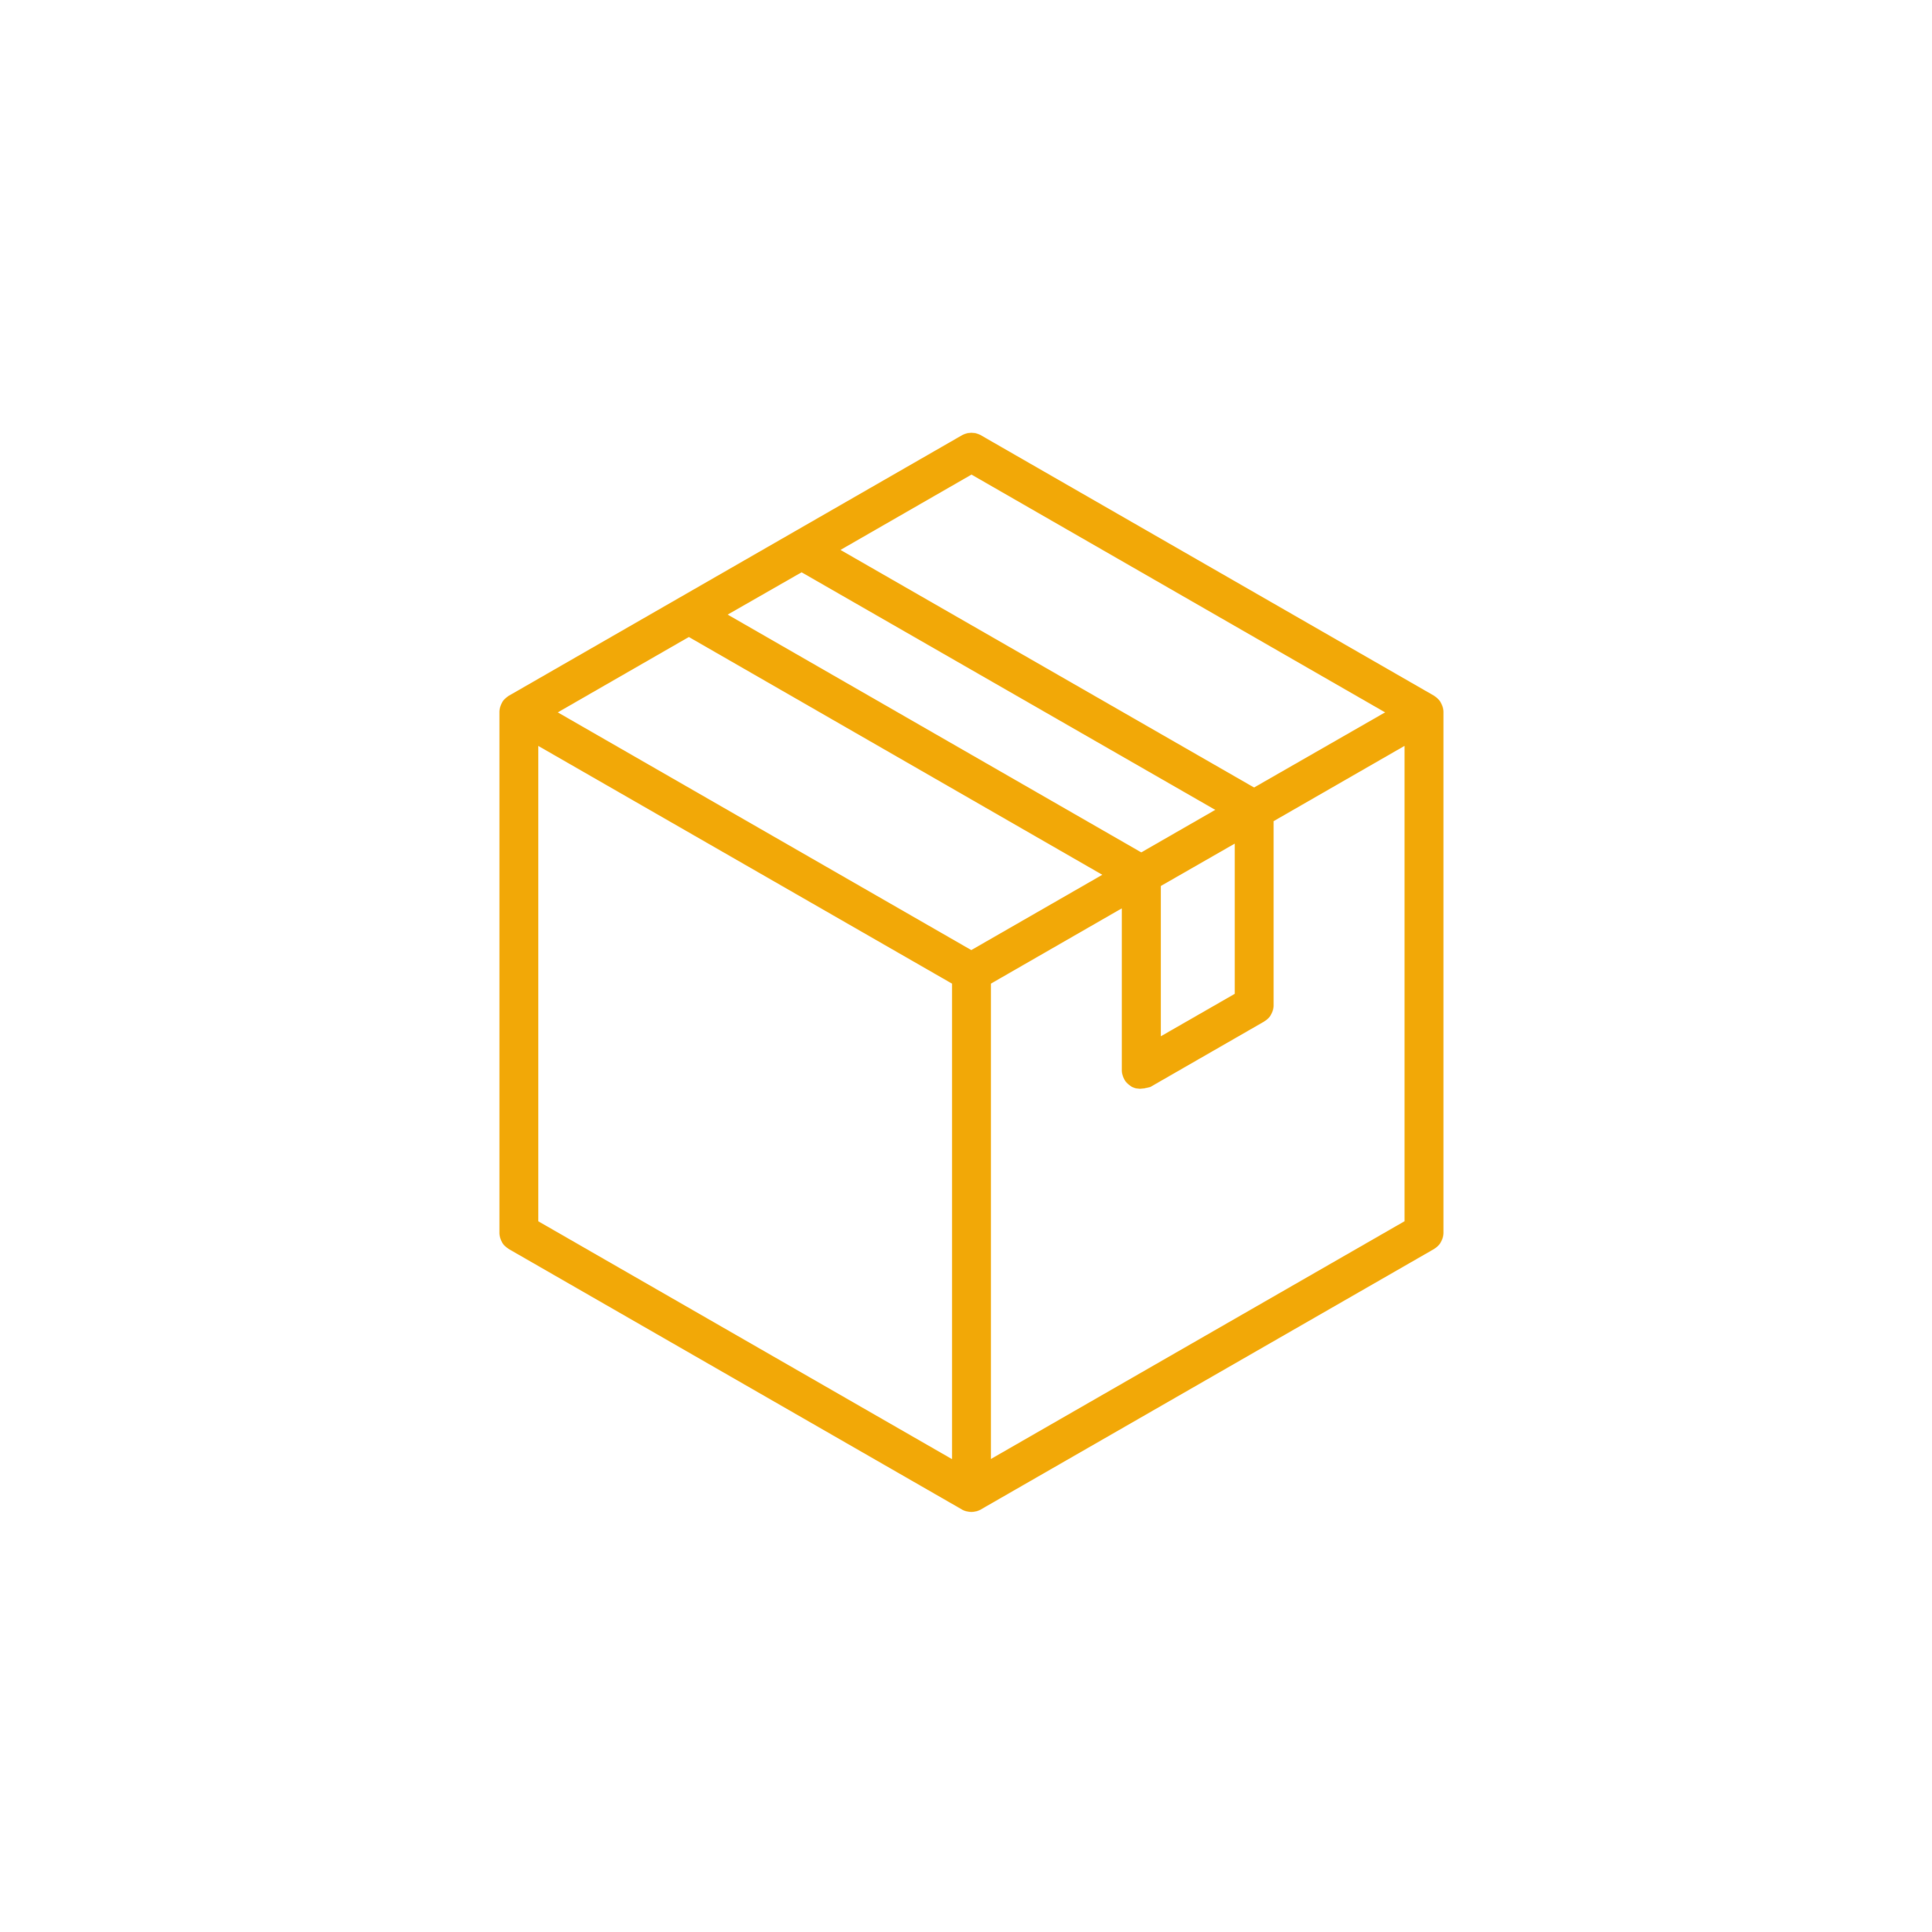 icon-size-box